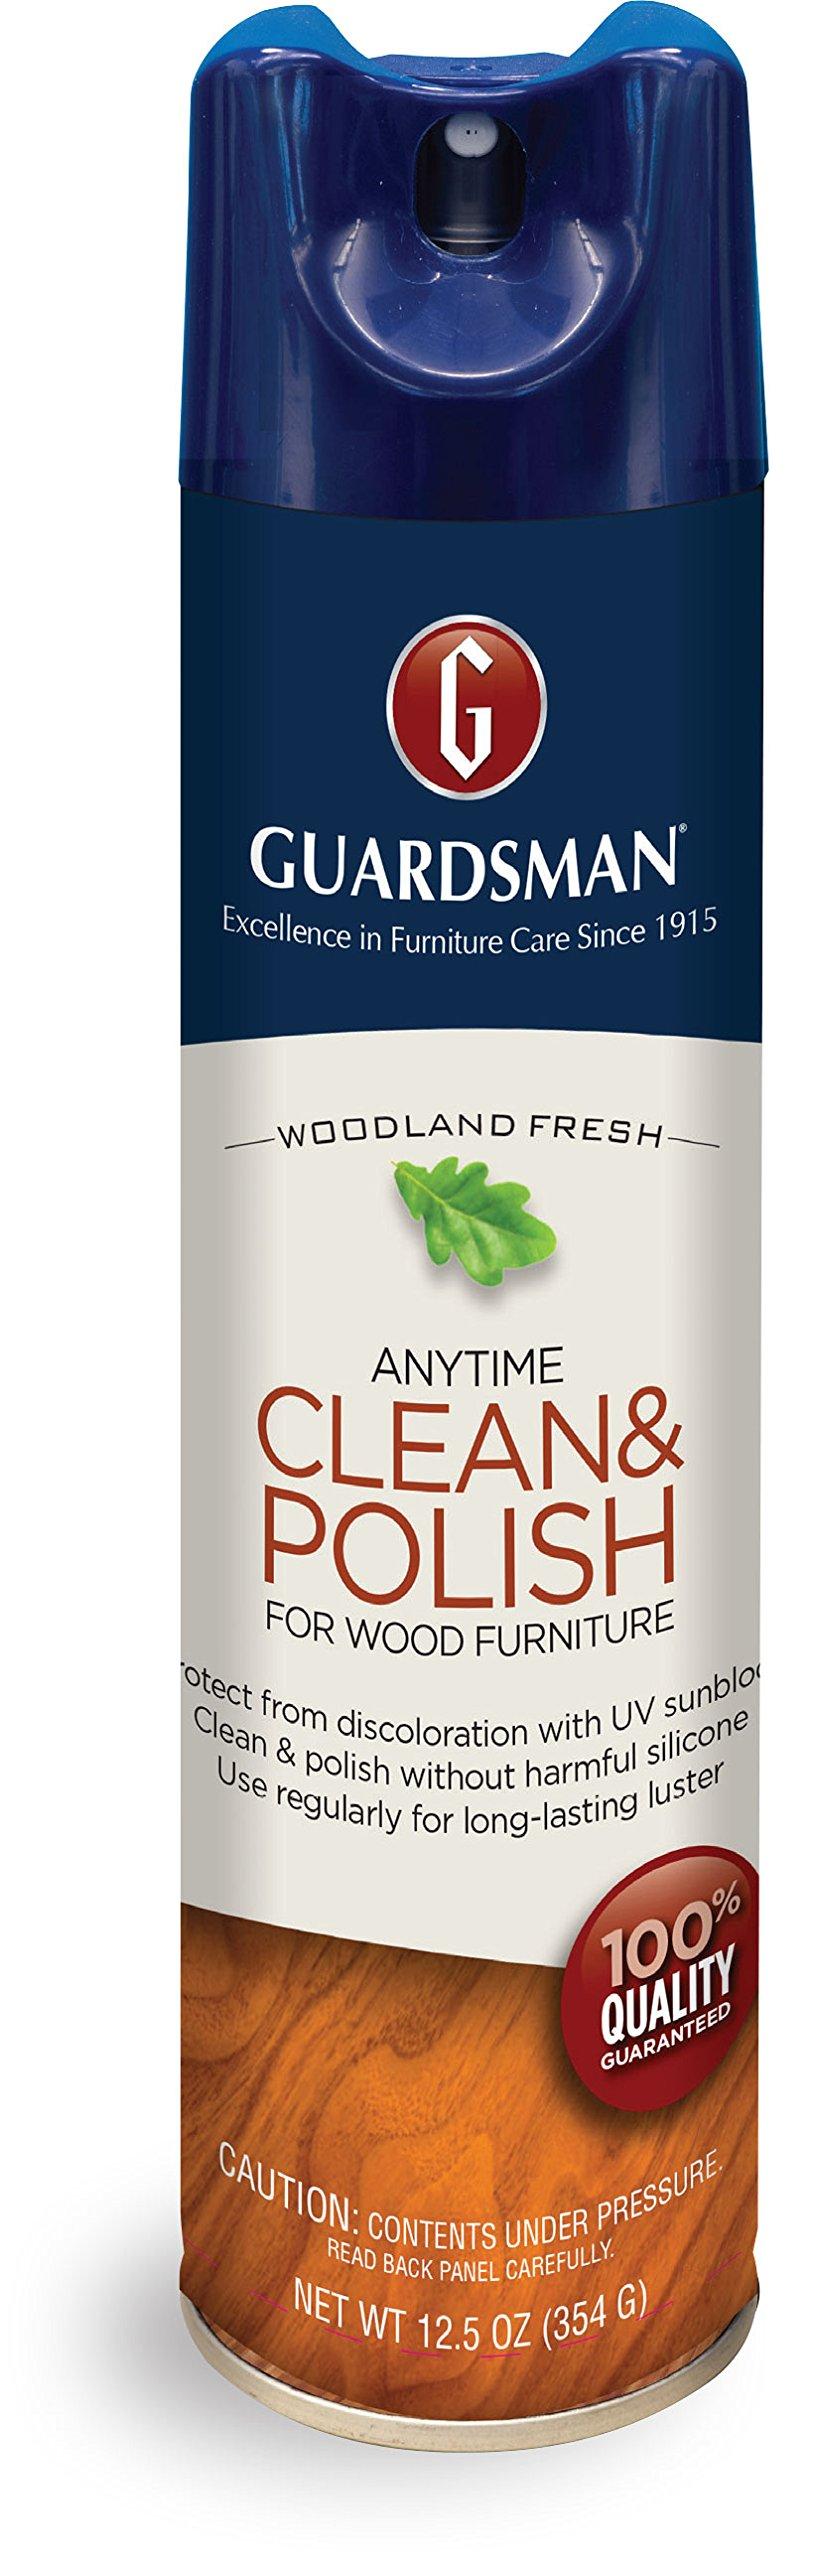 Guardsman Clean & Polish For Wood Furniture - Woodland Fresh - 12.5 oz - Silicone Free, UV Protection - 460100